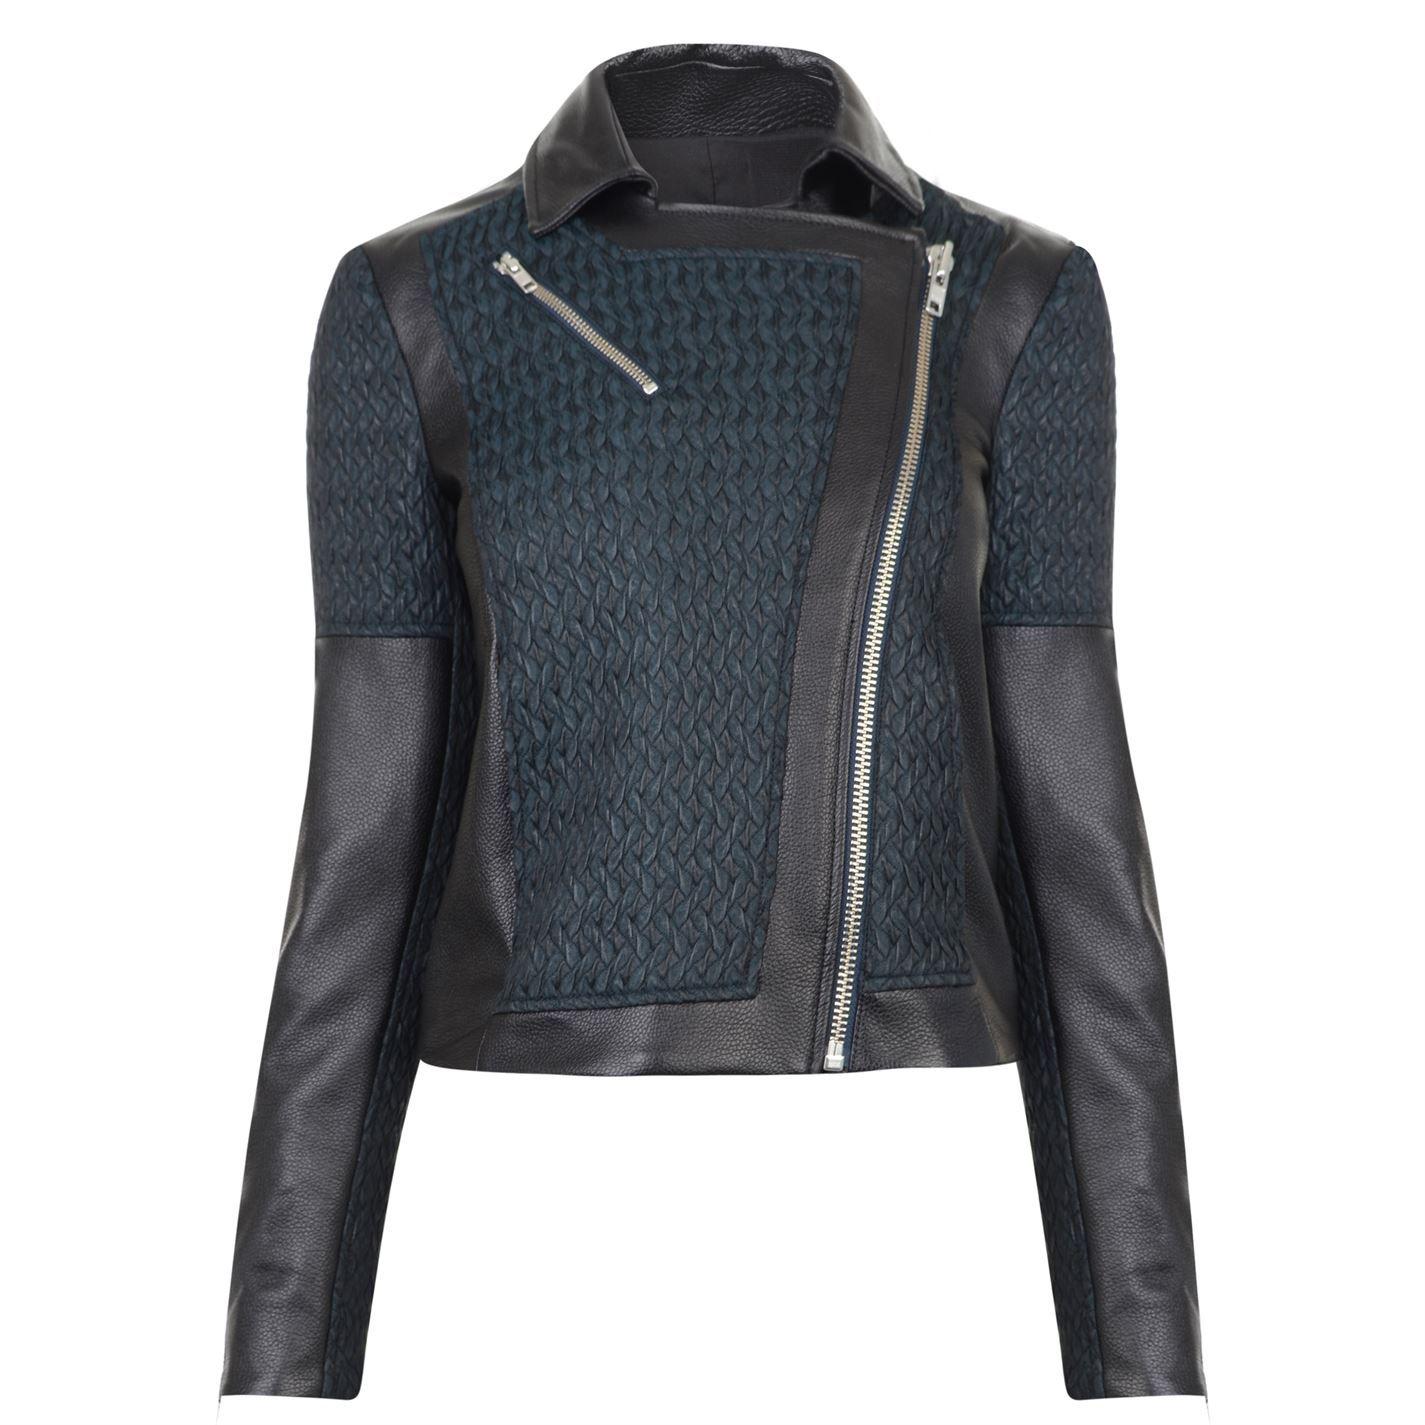 Helmut Lang Jacquard Leather Biker Jacket Womens